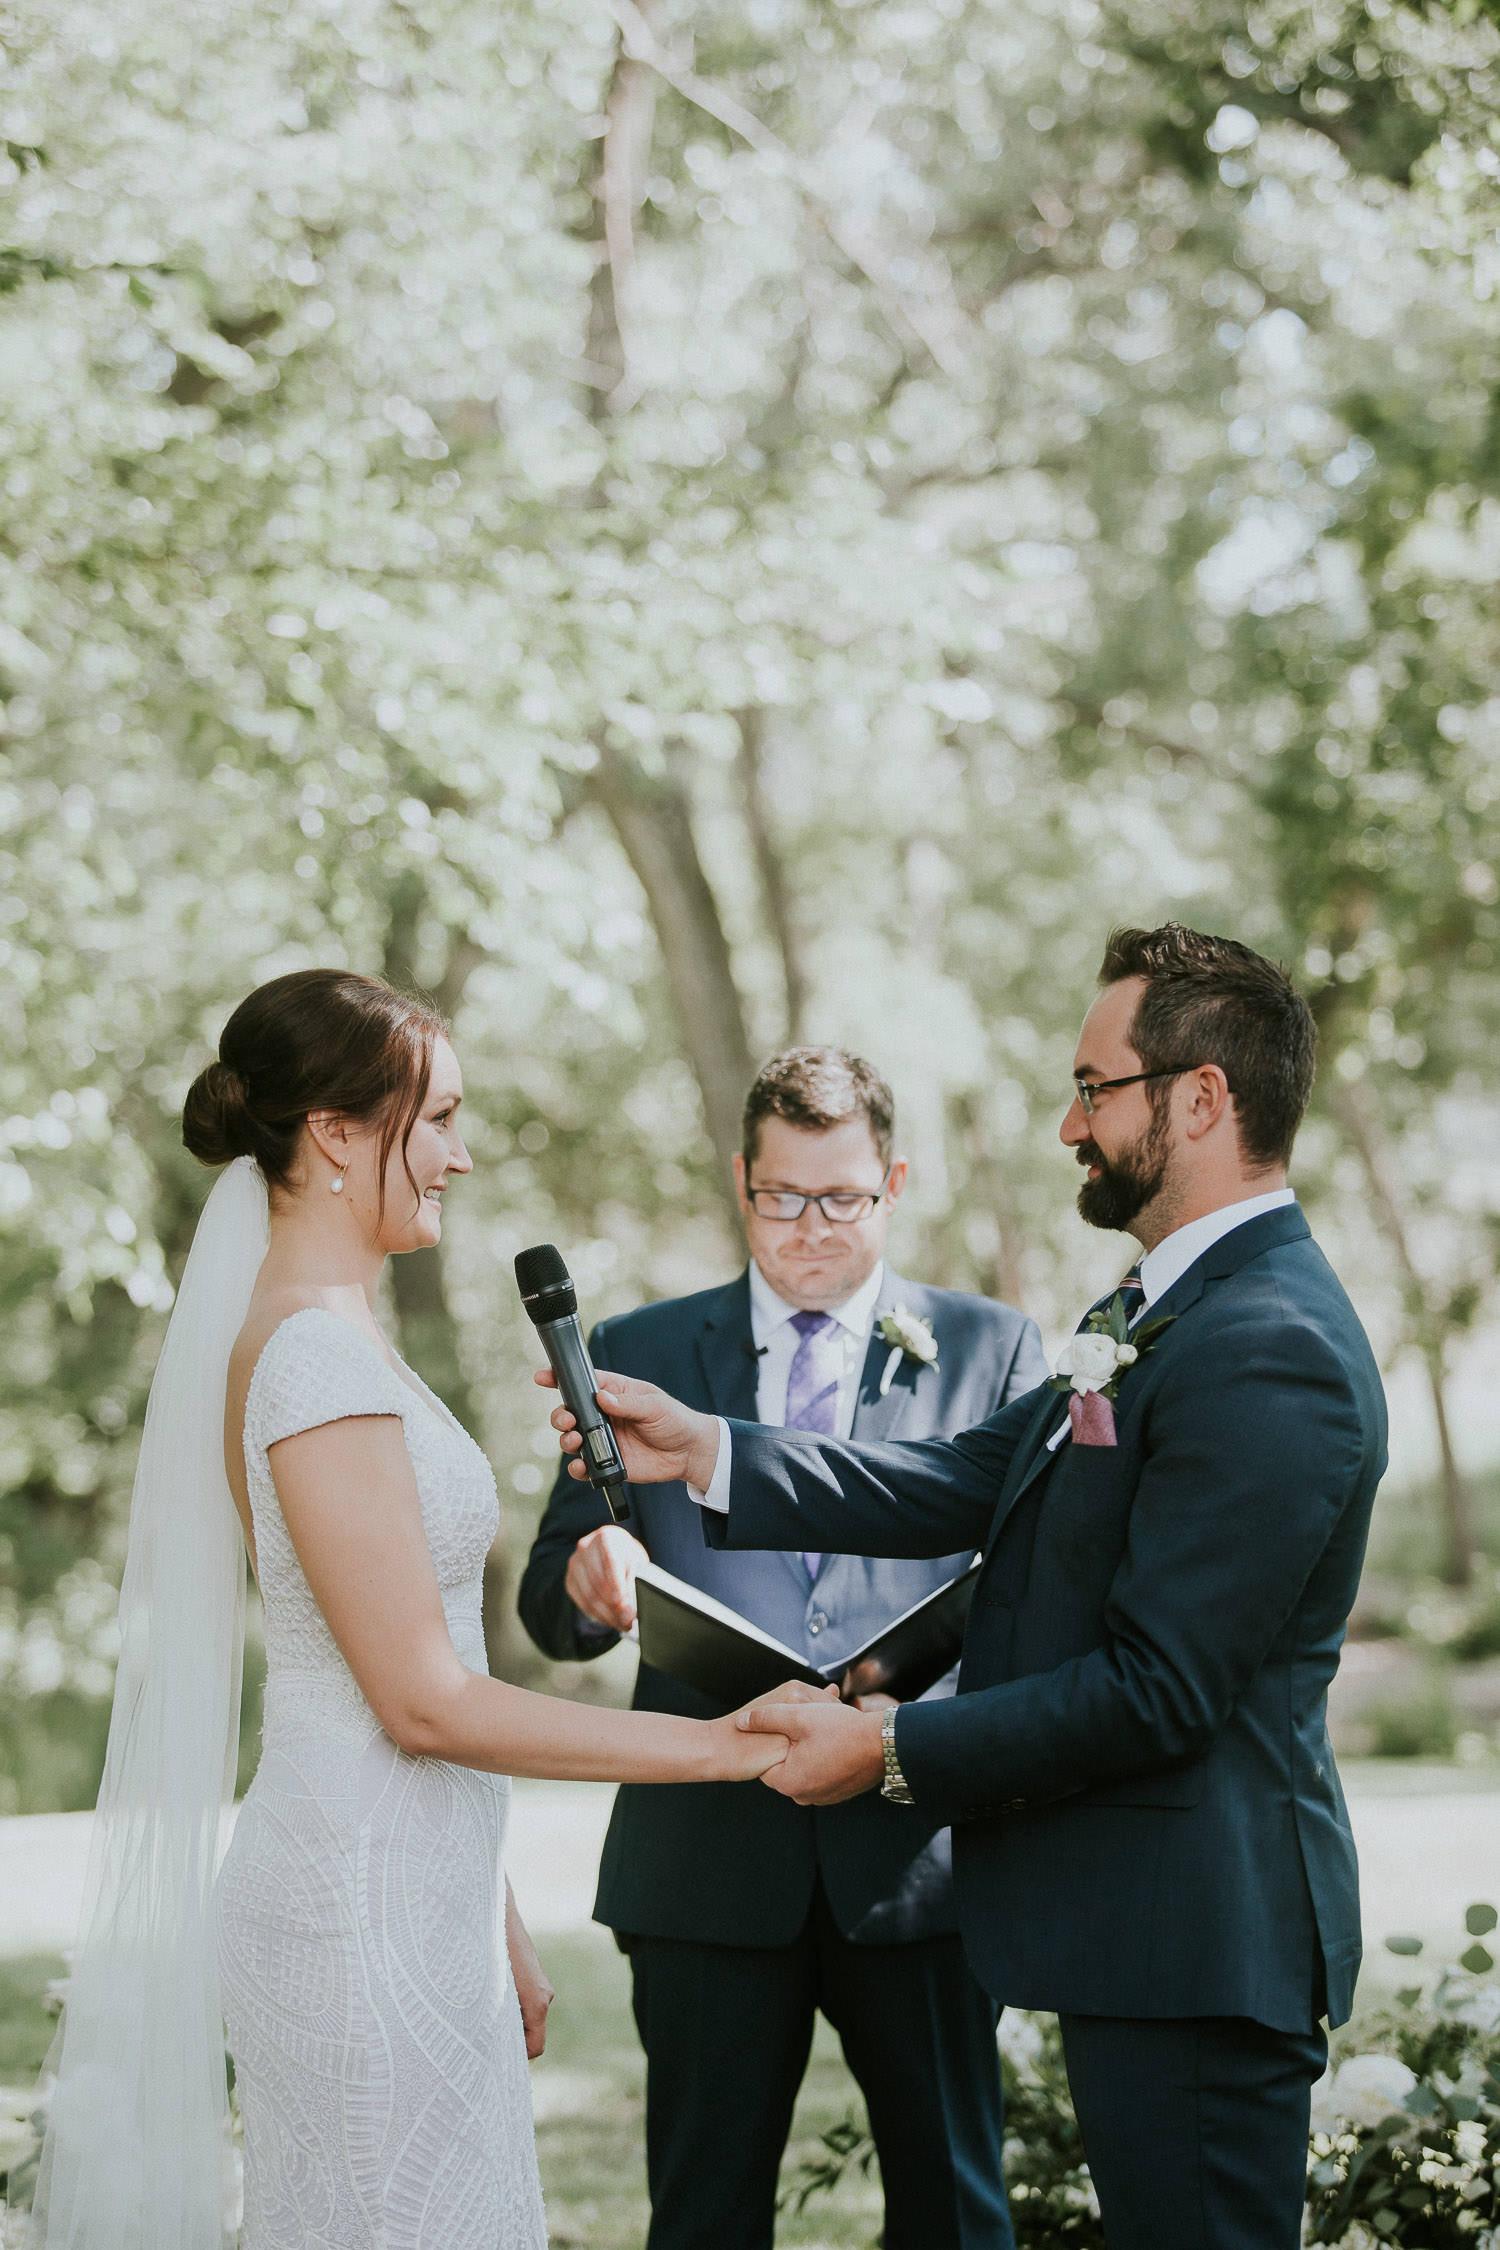 summer-backyard-wedding-in-alberta-sarah-pukin-0110